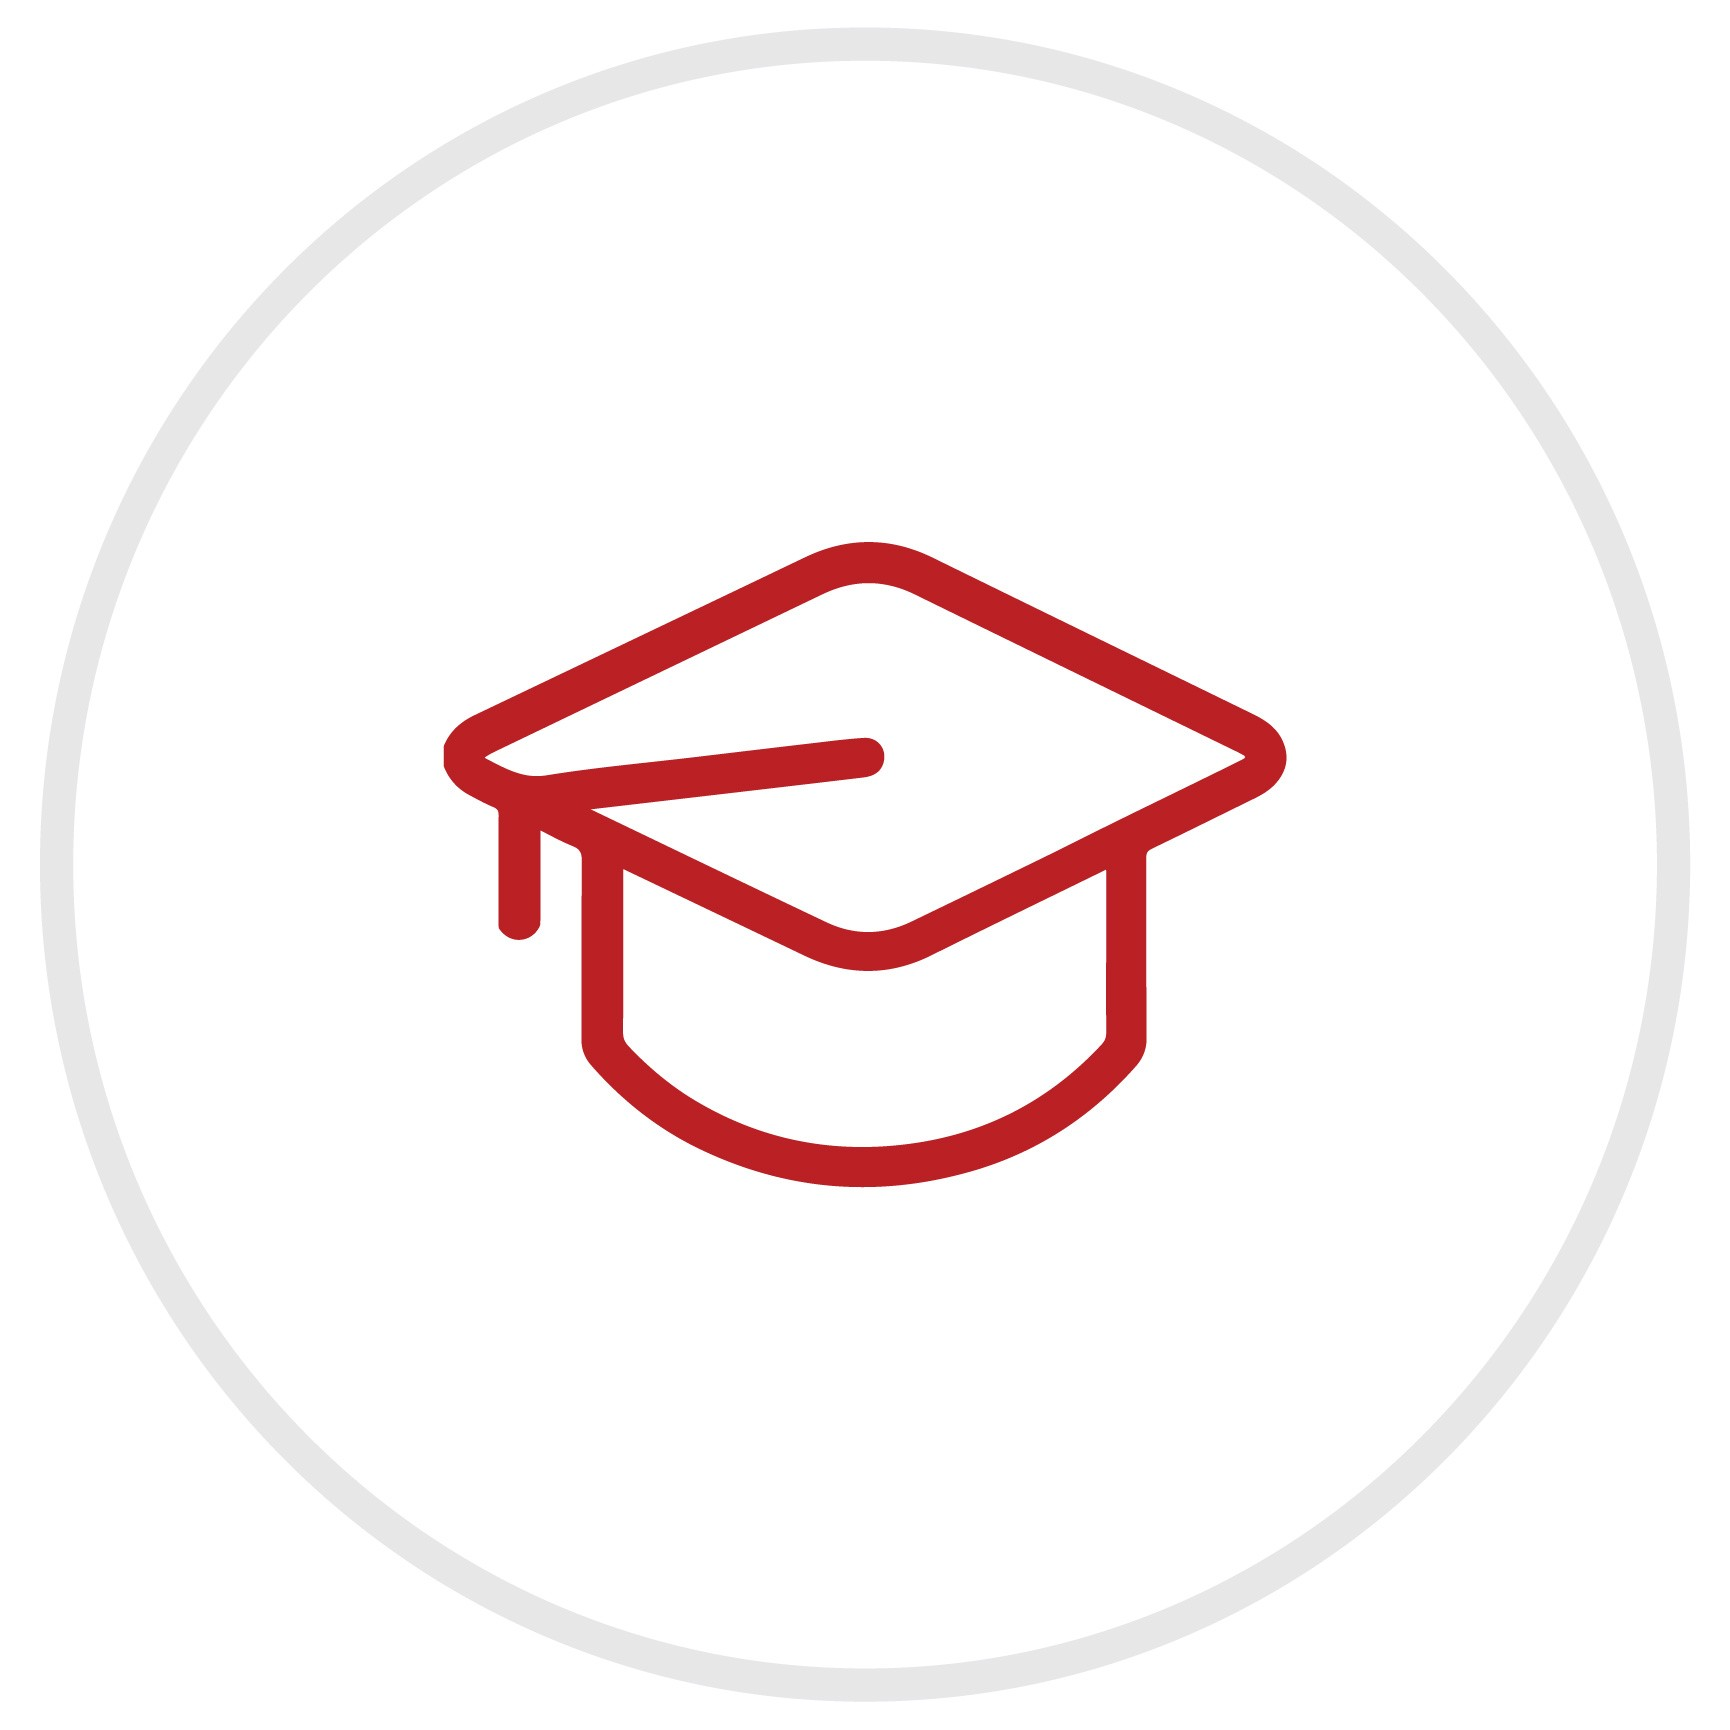 Icon of a graduation cap